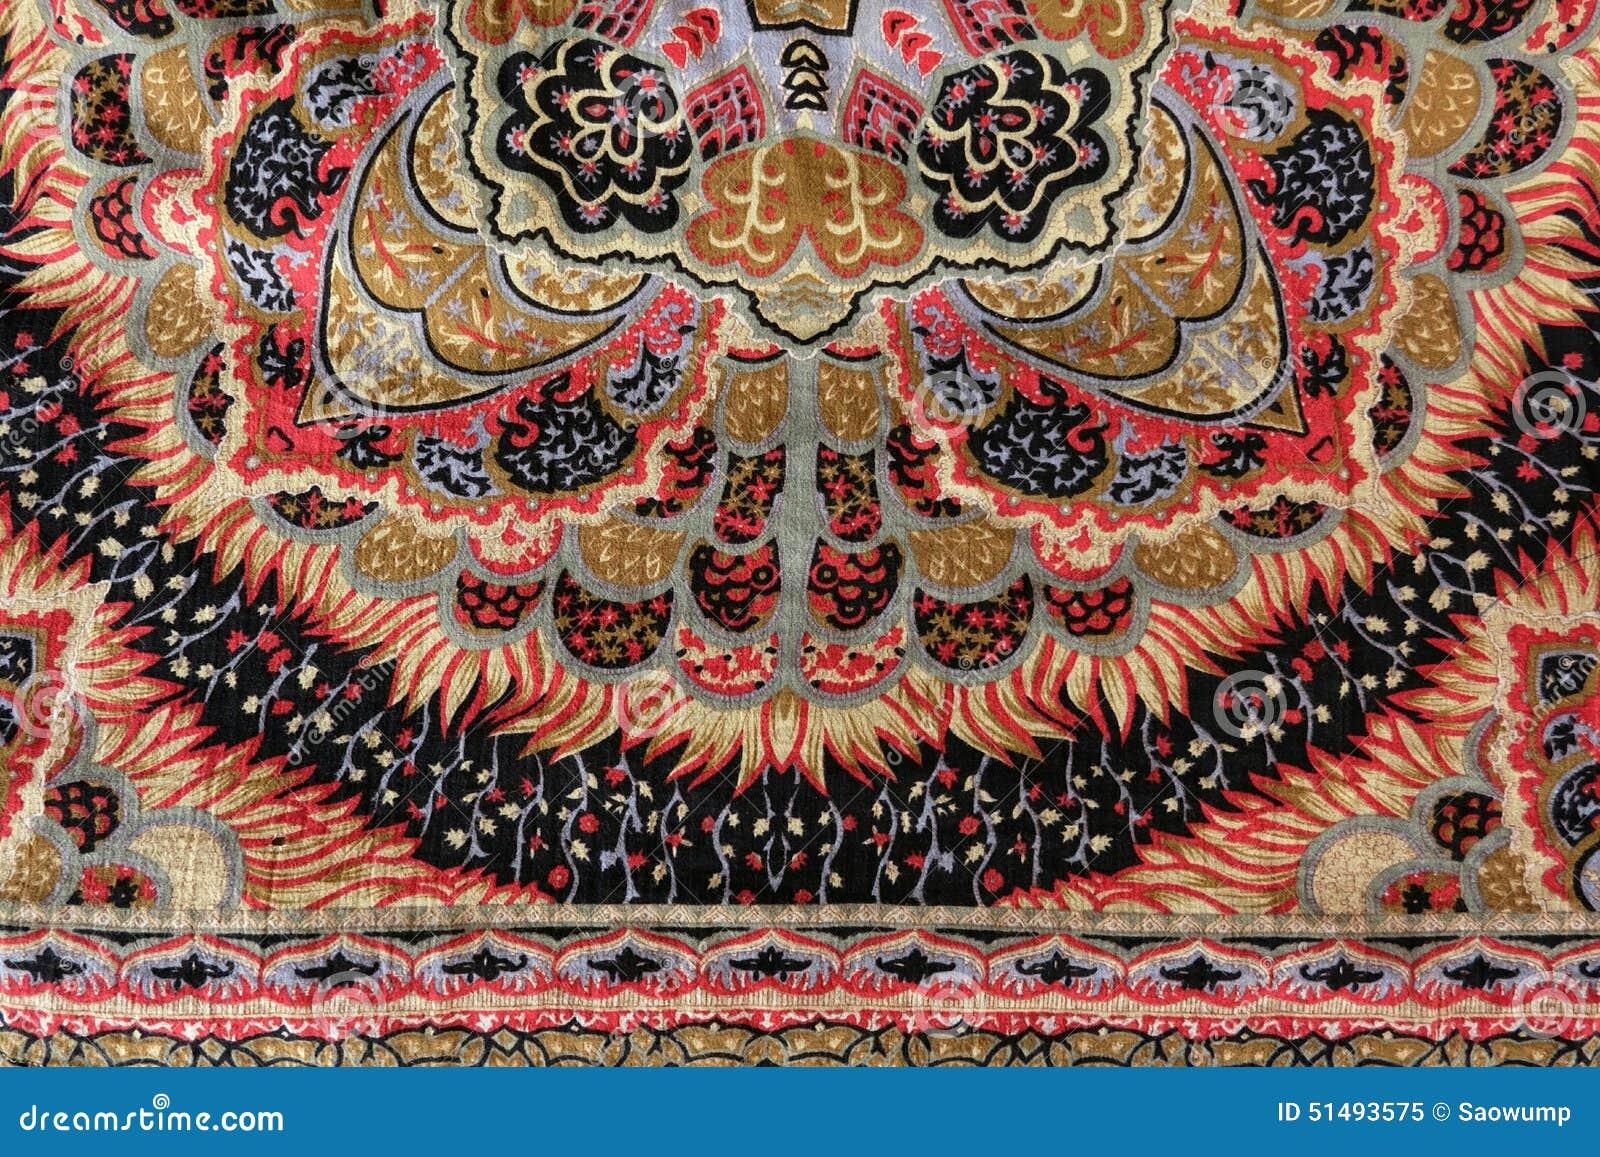 Vintage Gypsy Pattern Design Fabric